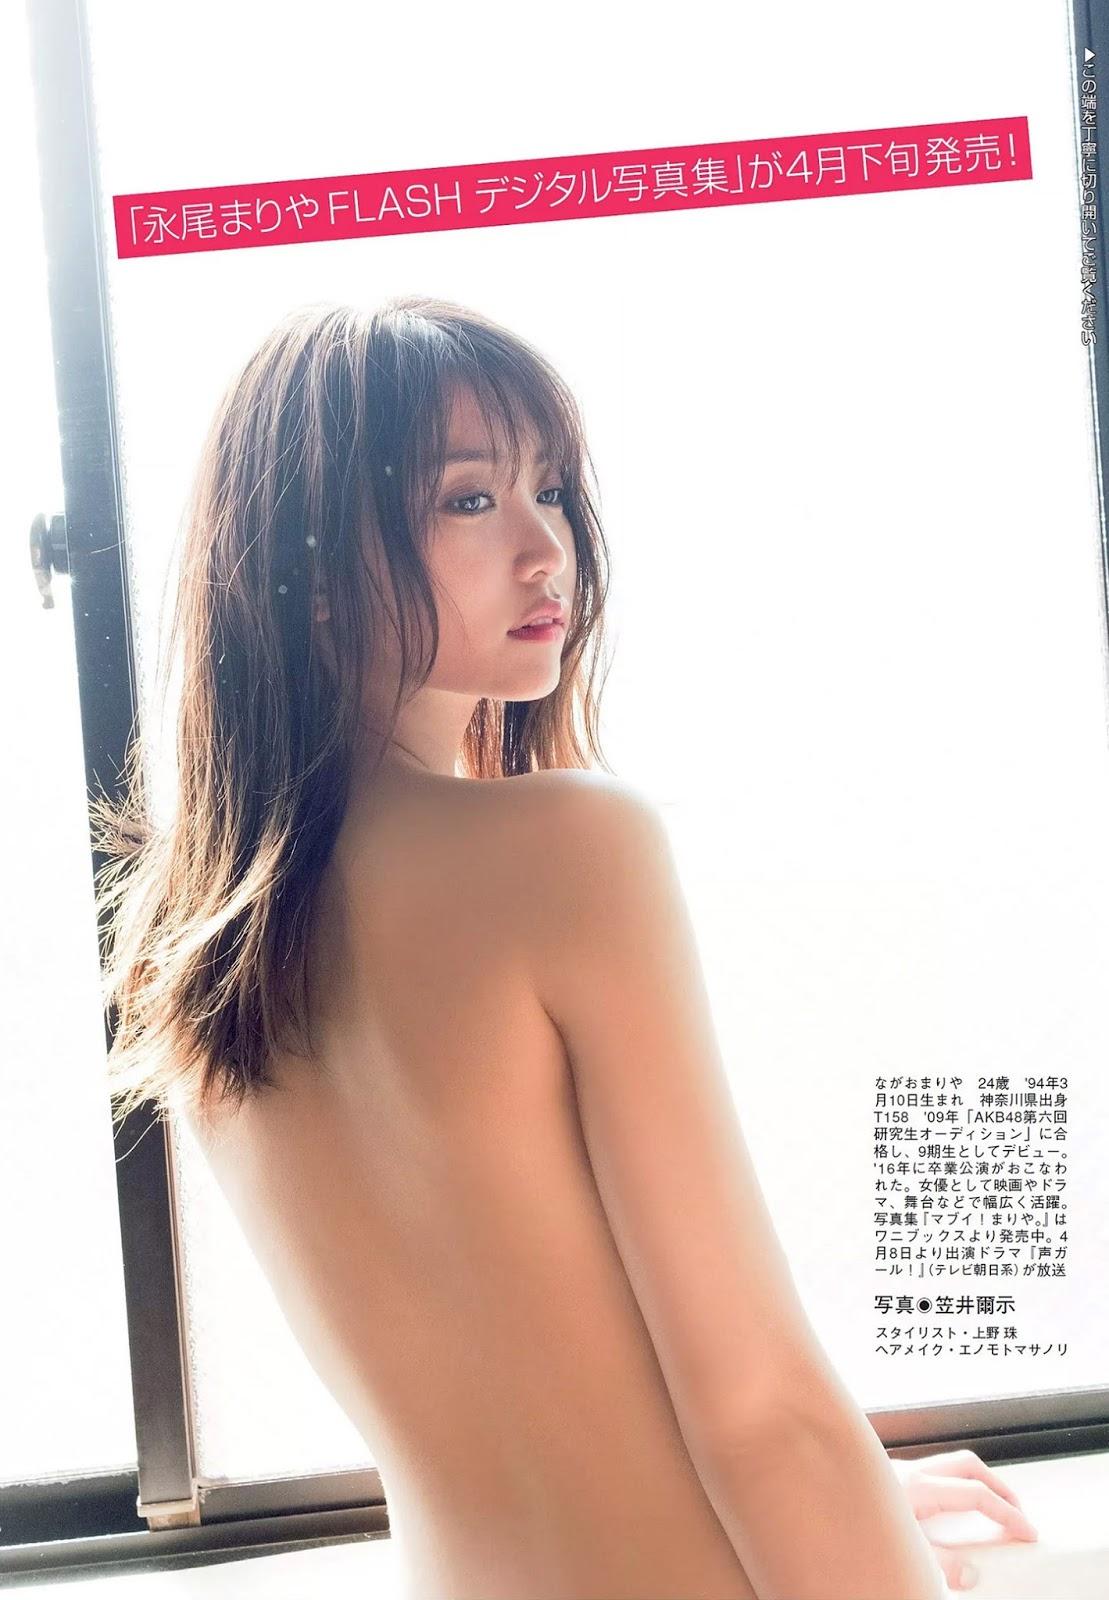 Nagao Mariya 永尾まりや, FLASH 2018.04.17 (フラッシュ 2018年4月17日号)